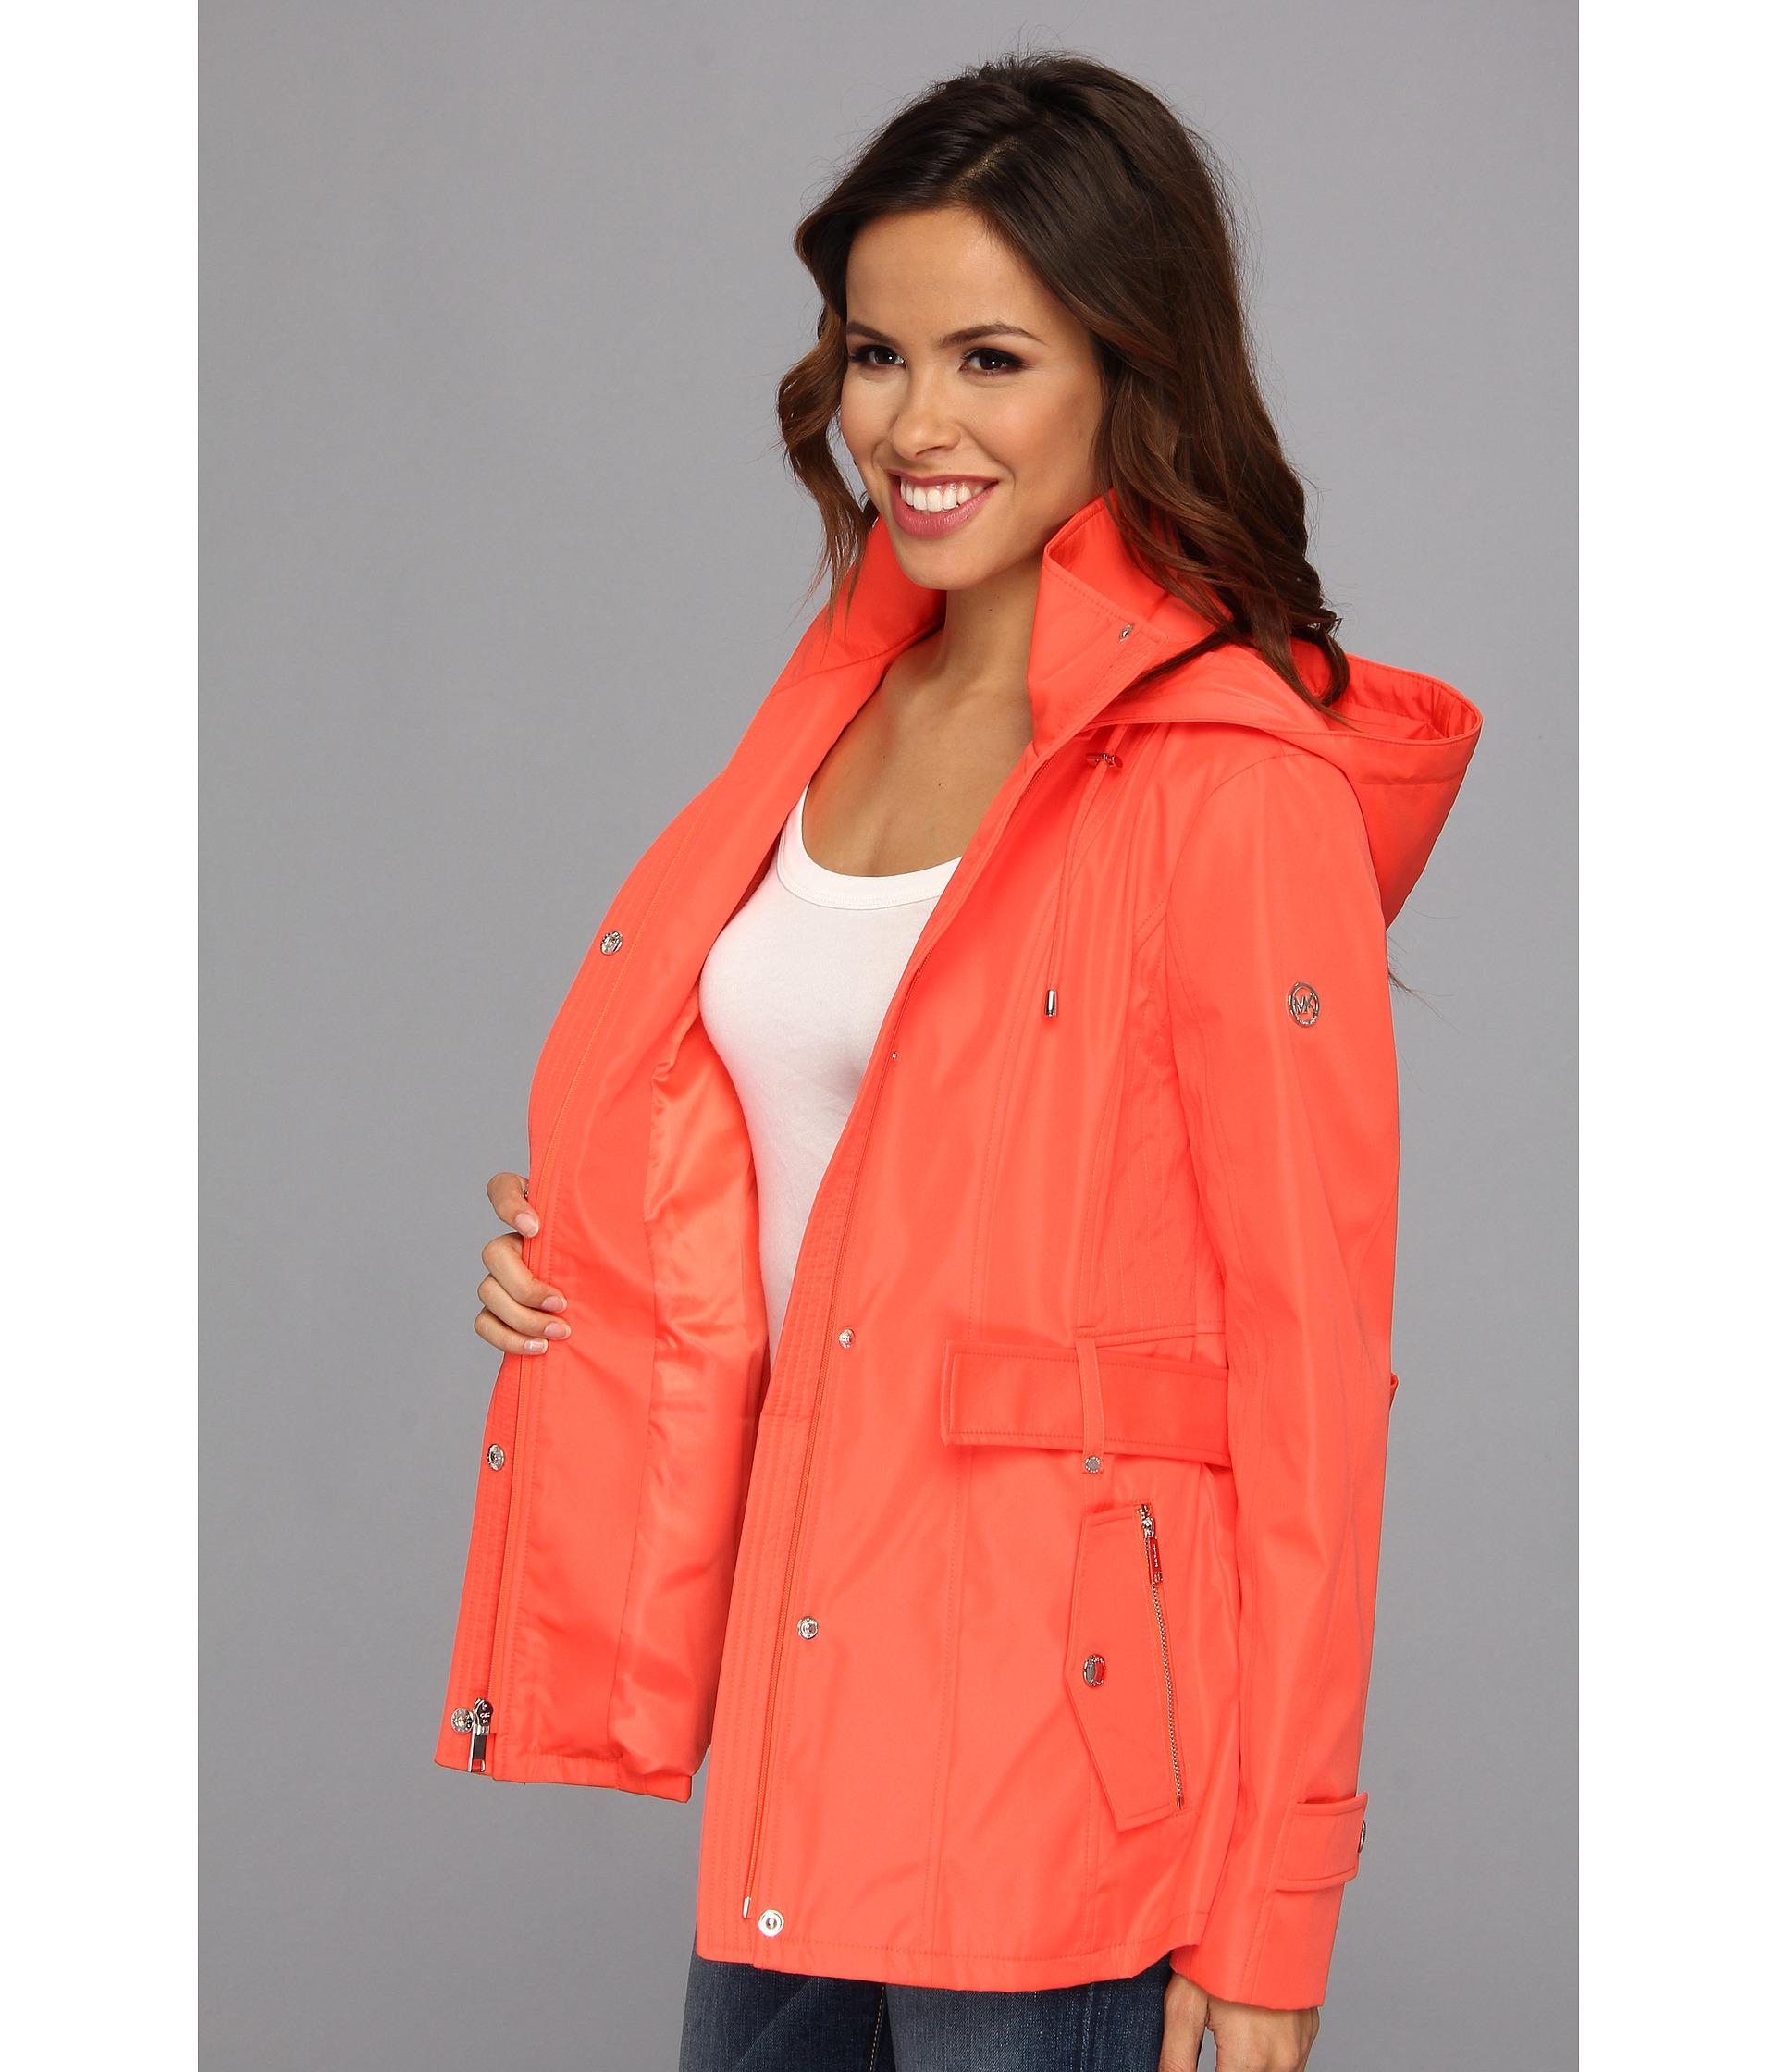 Michael michael kors Hooded Rain Jacket in Orange   Lyst